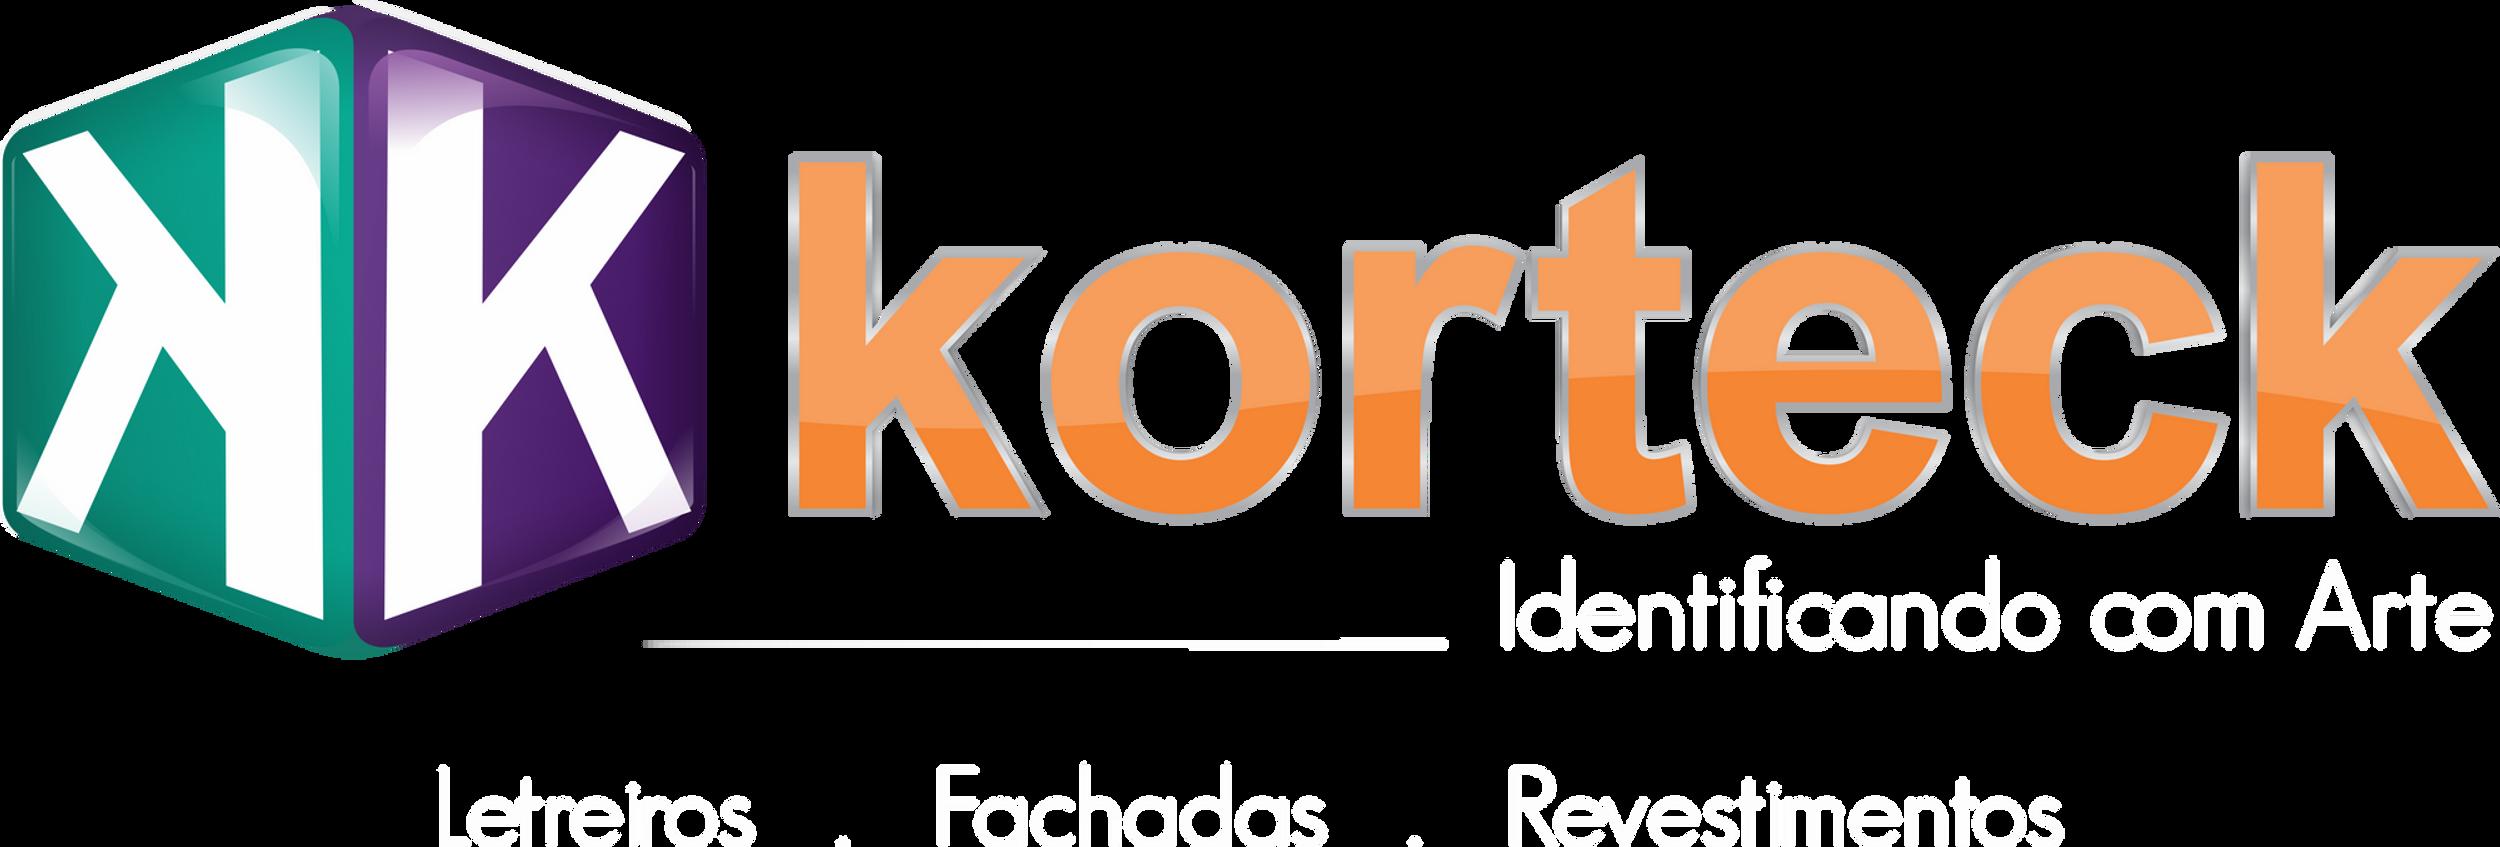 (c) Korteck.com.br